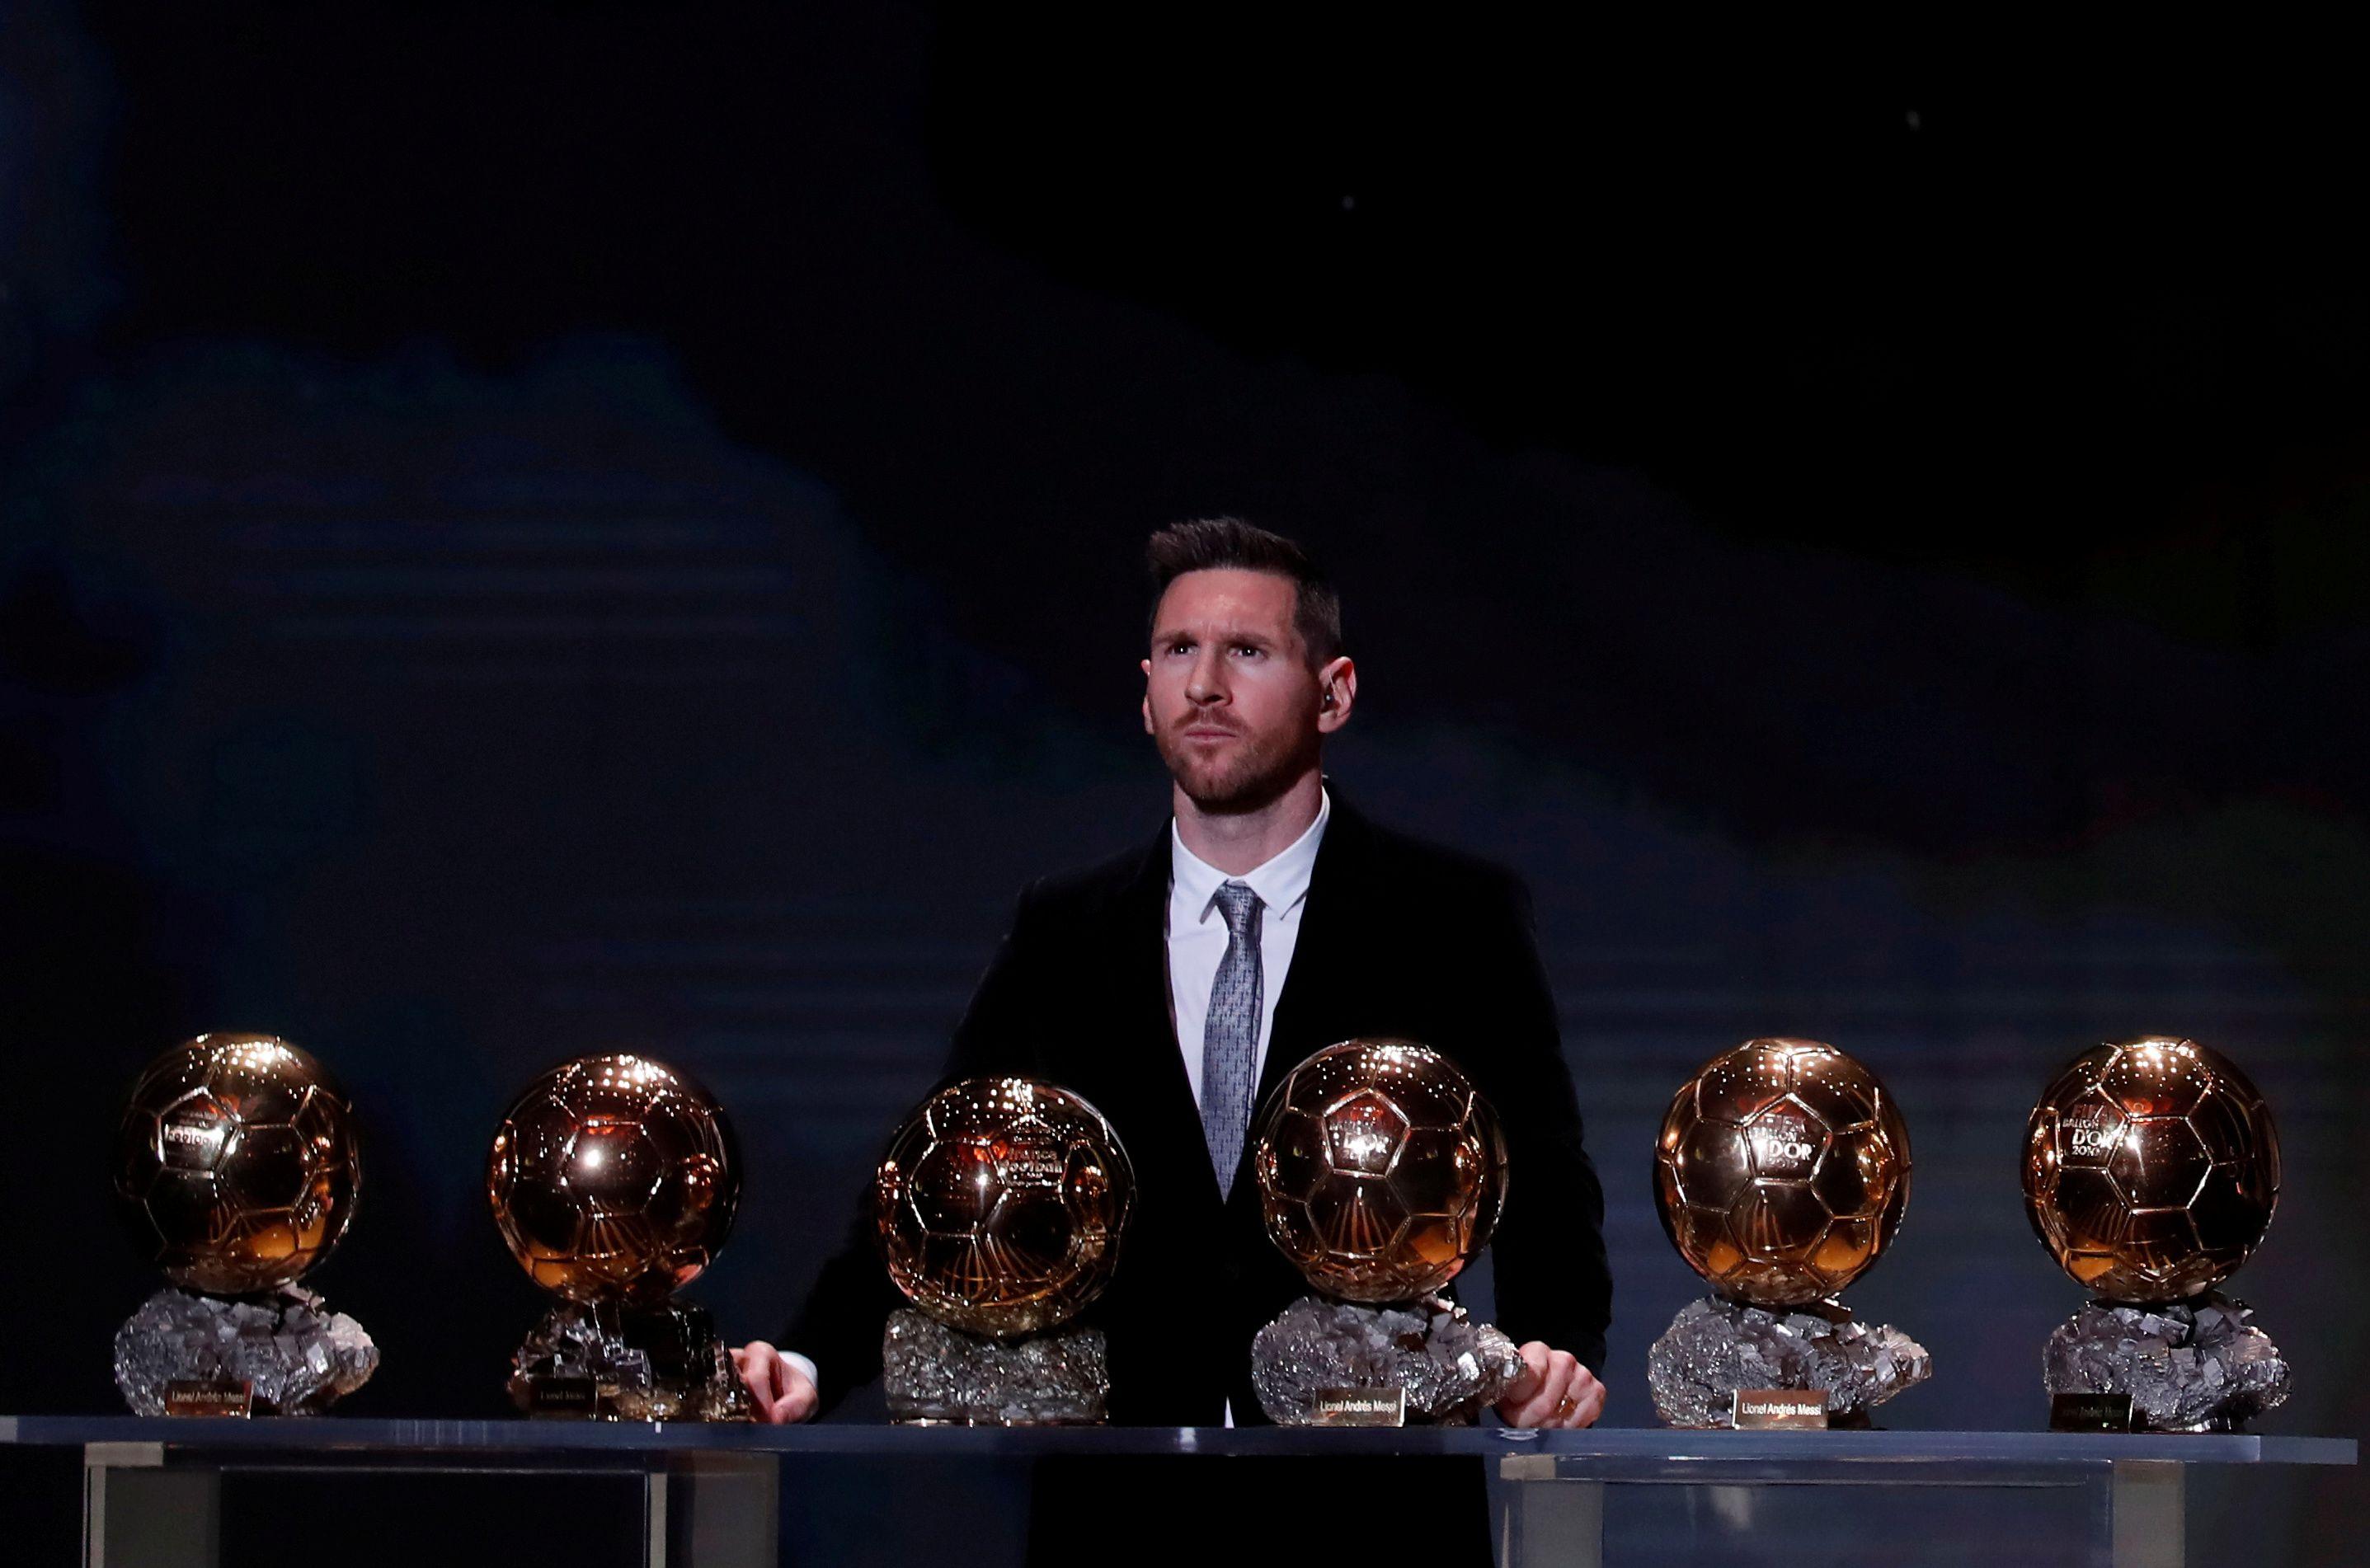 Lionel Messi ganó su sexto Balón de Oro (REUTERS/Christian Hartmann)